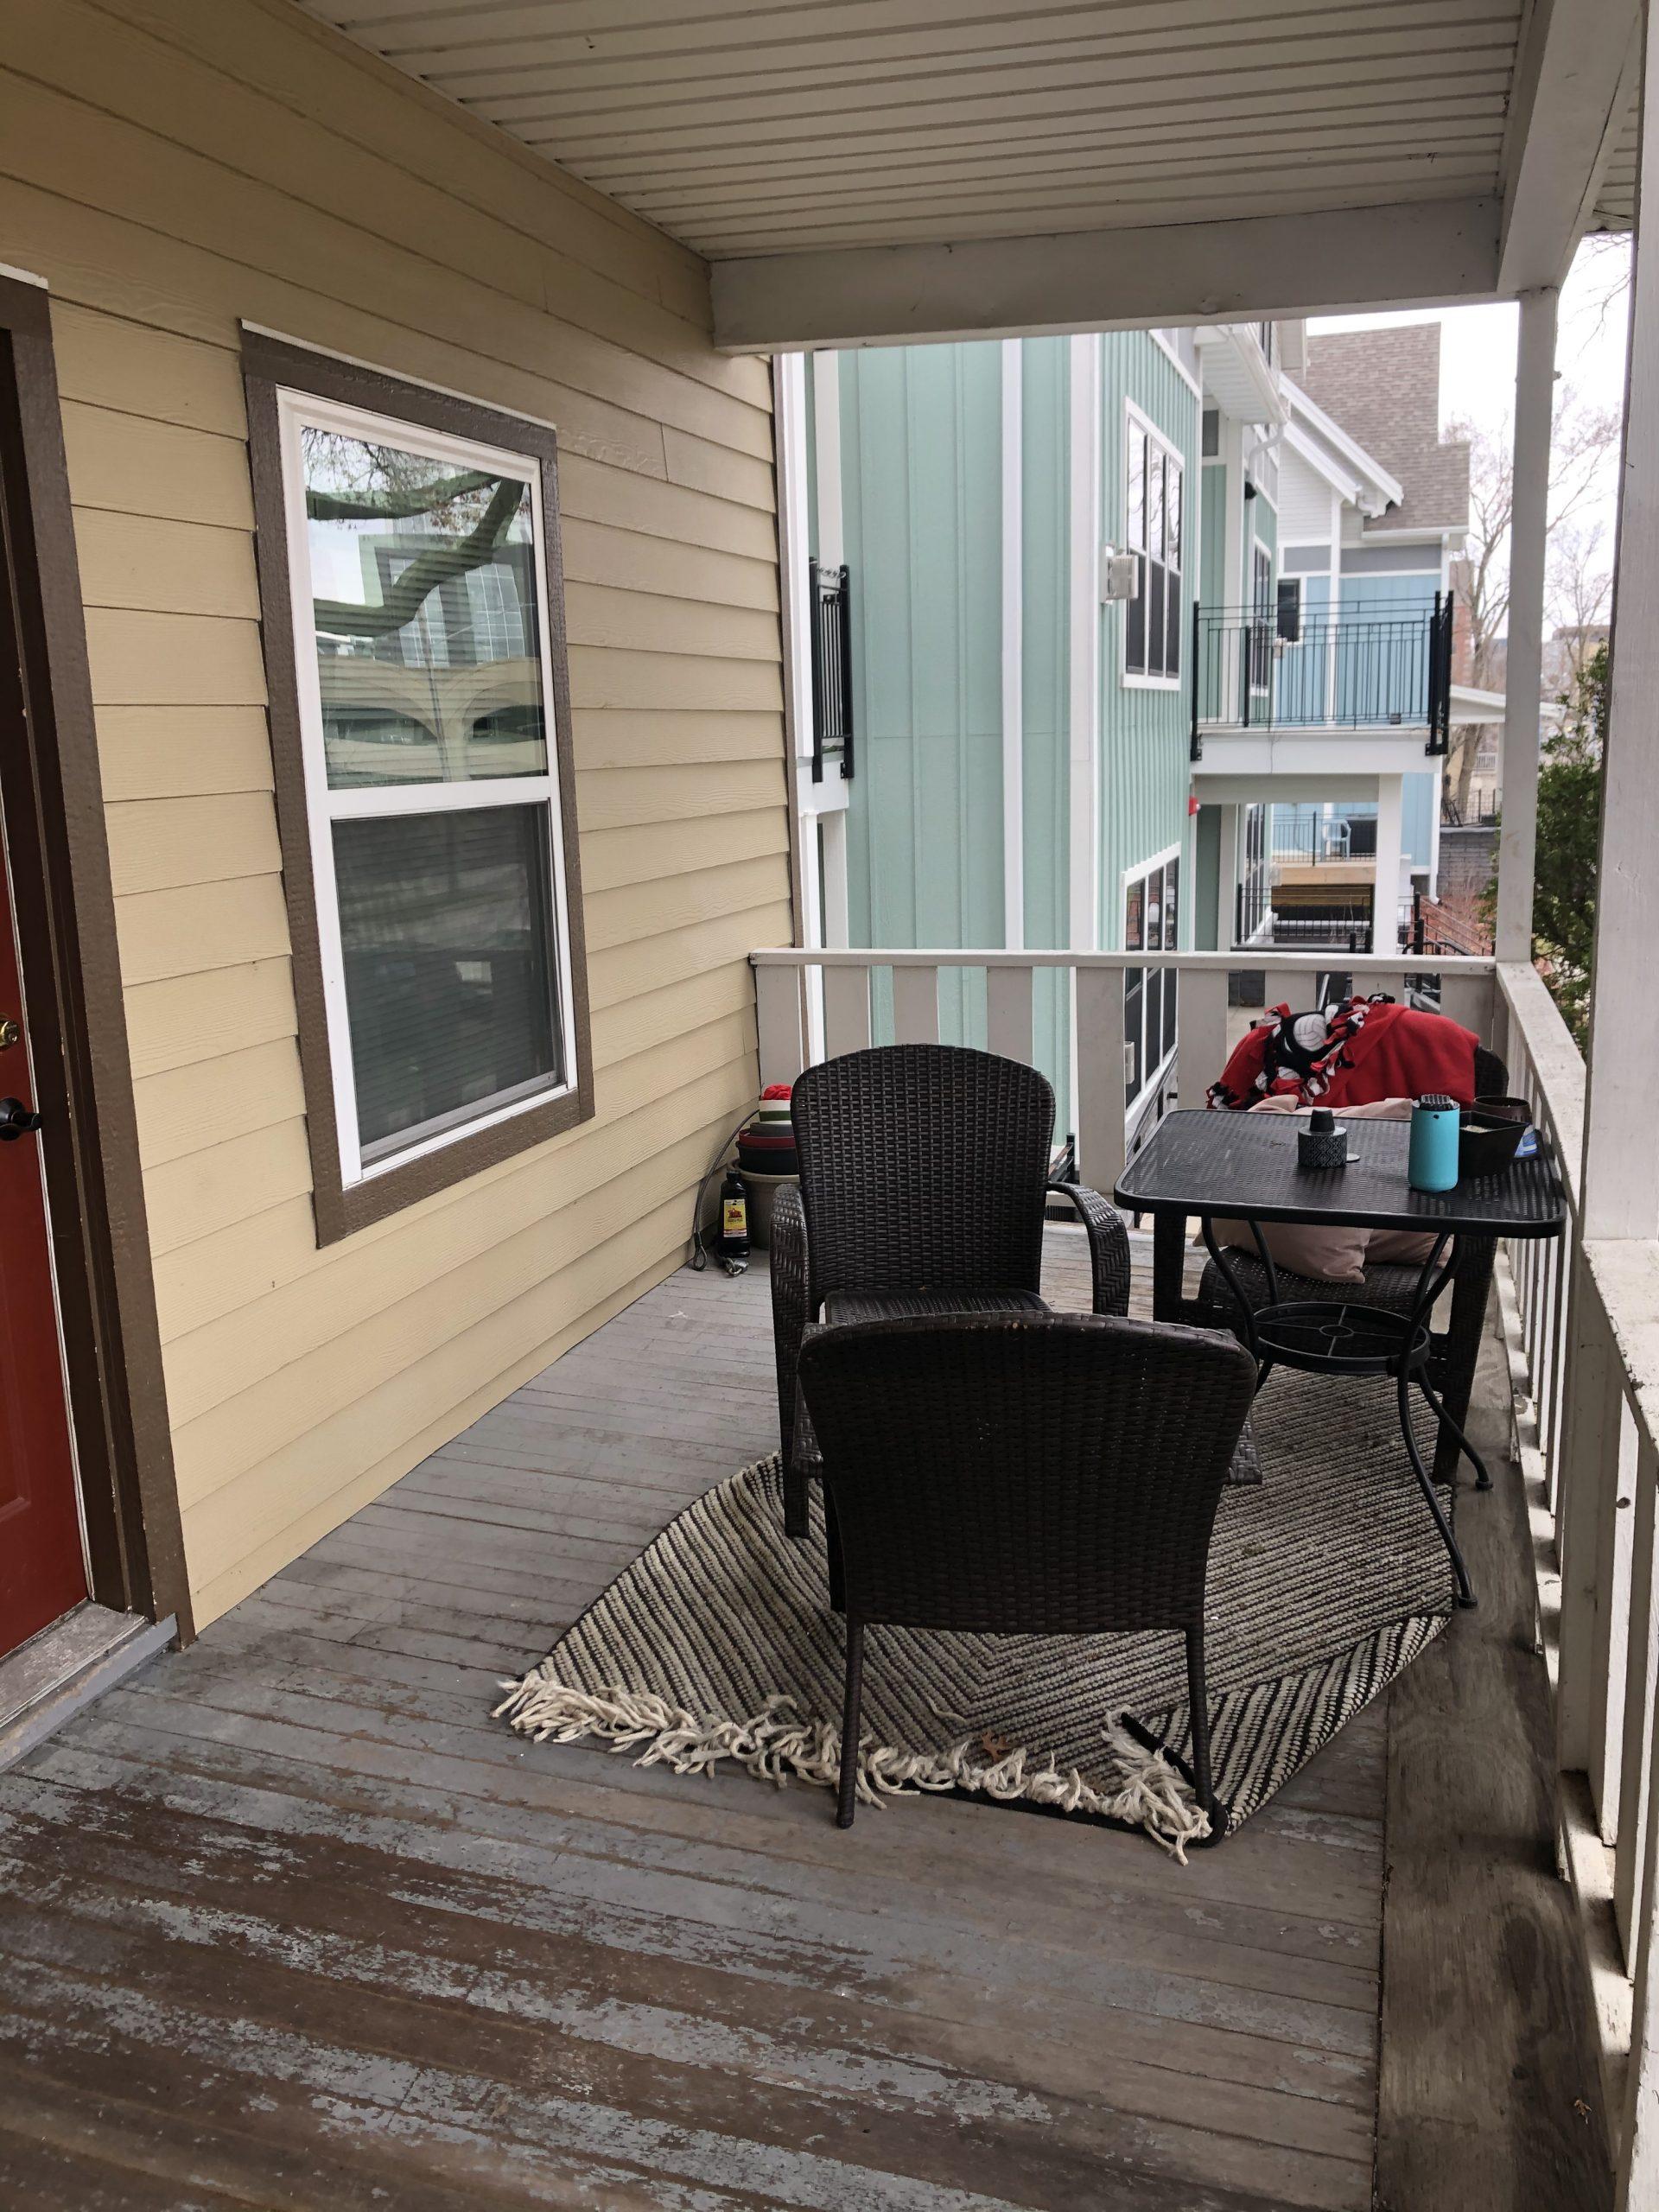 515-college-1_iowa-city_j-and-j-apartments_porch